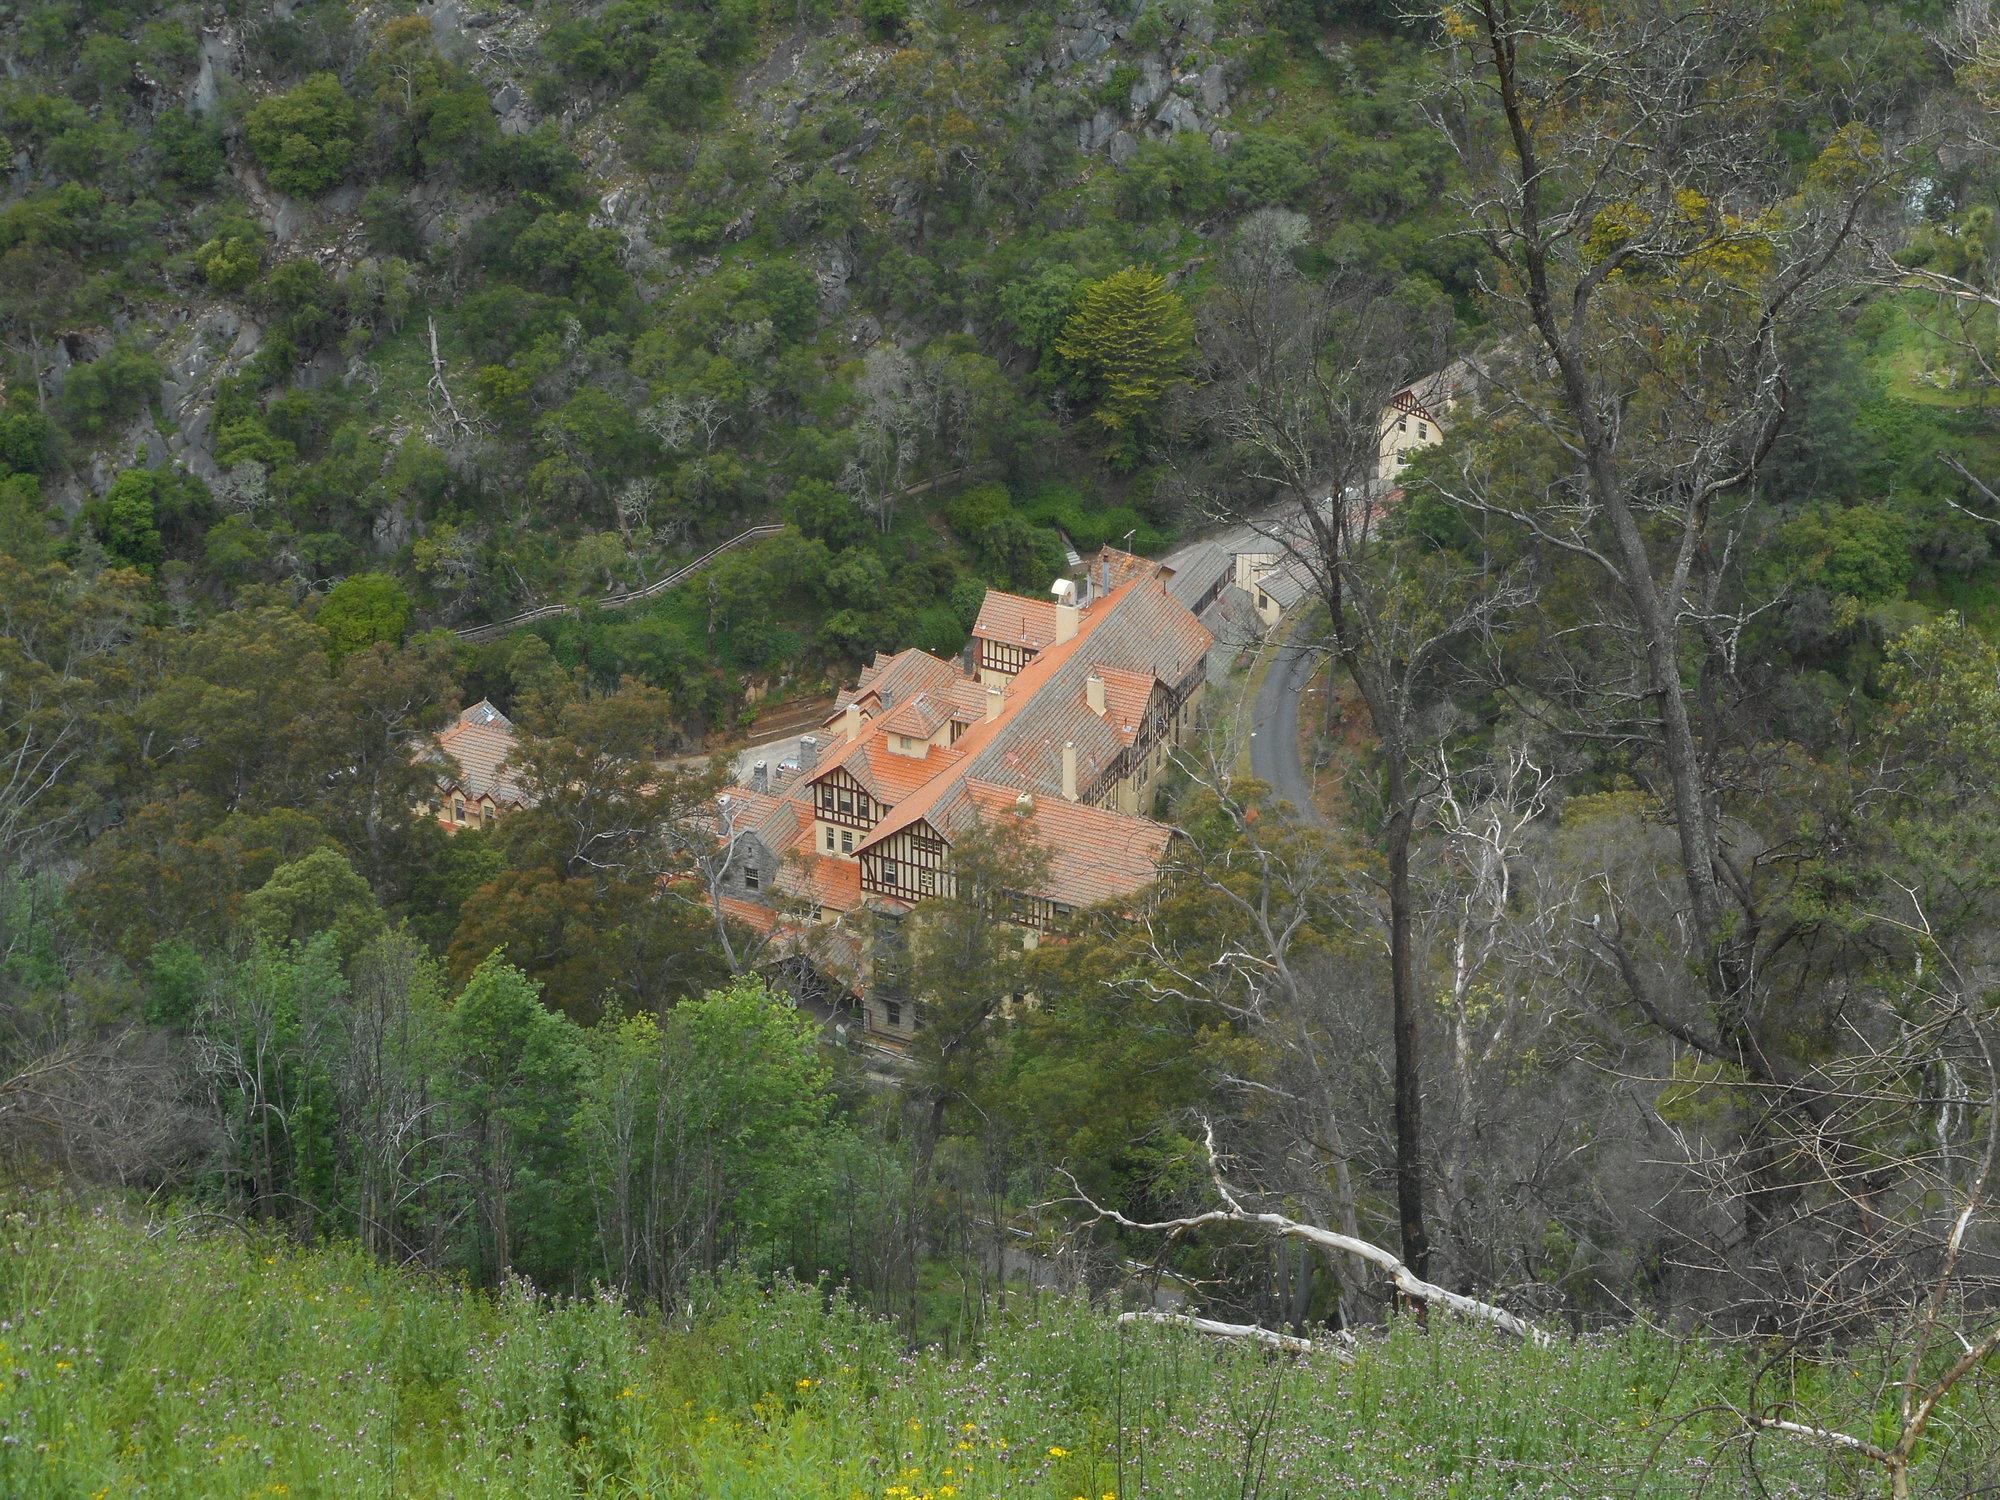 jenolan caves house.JPG